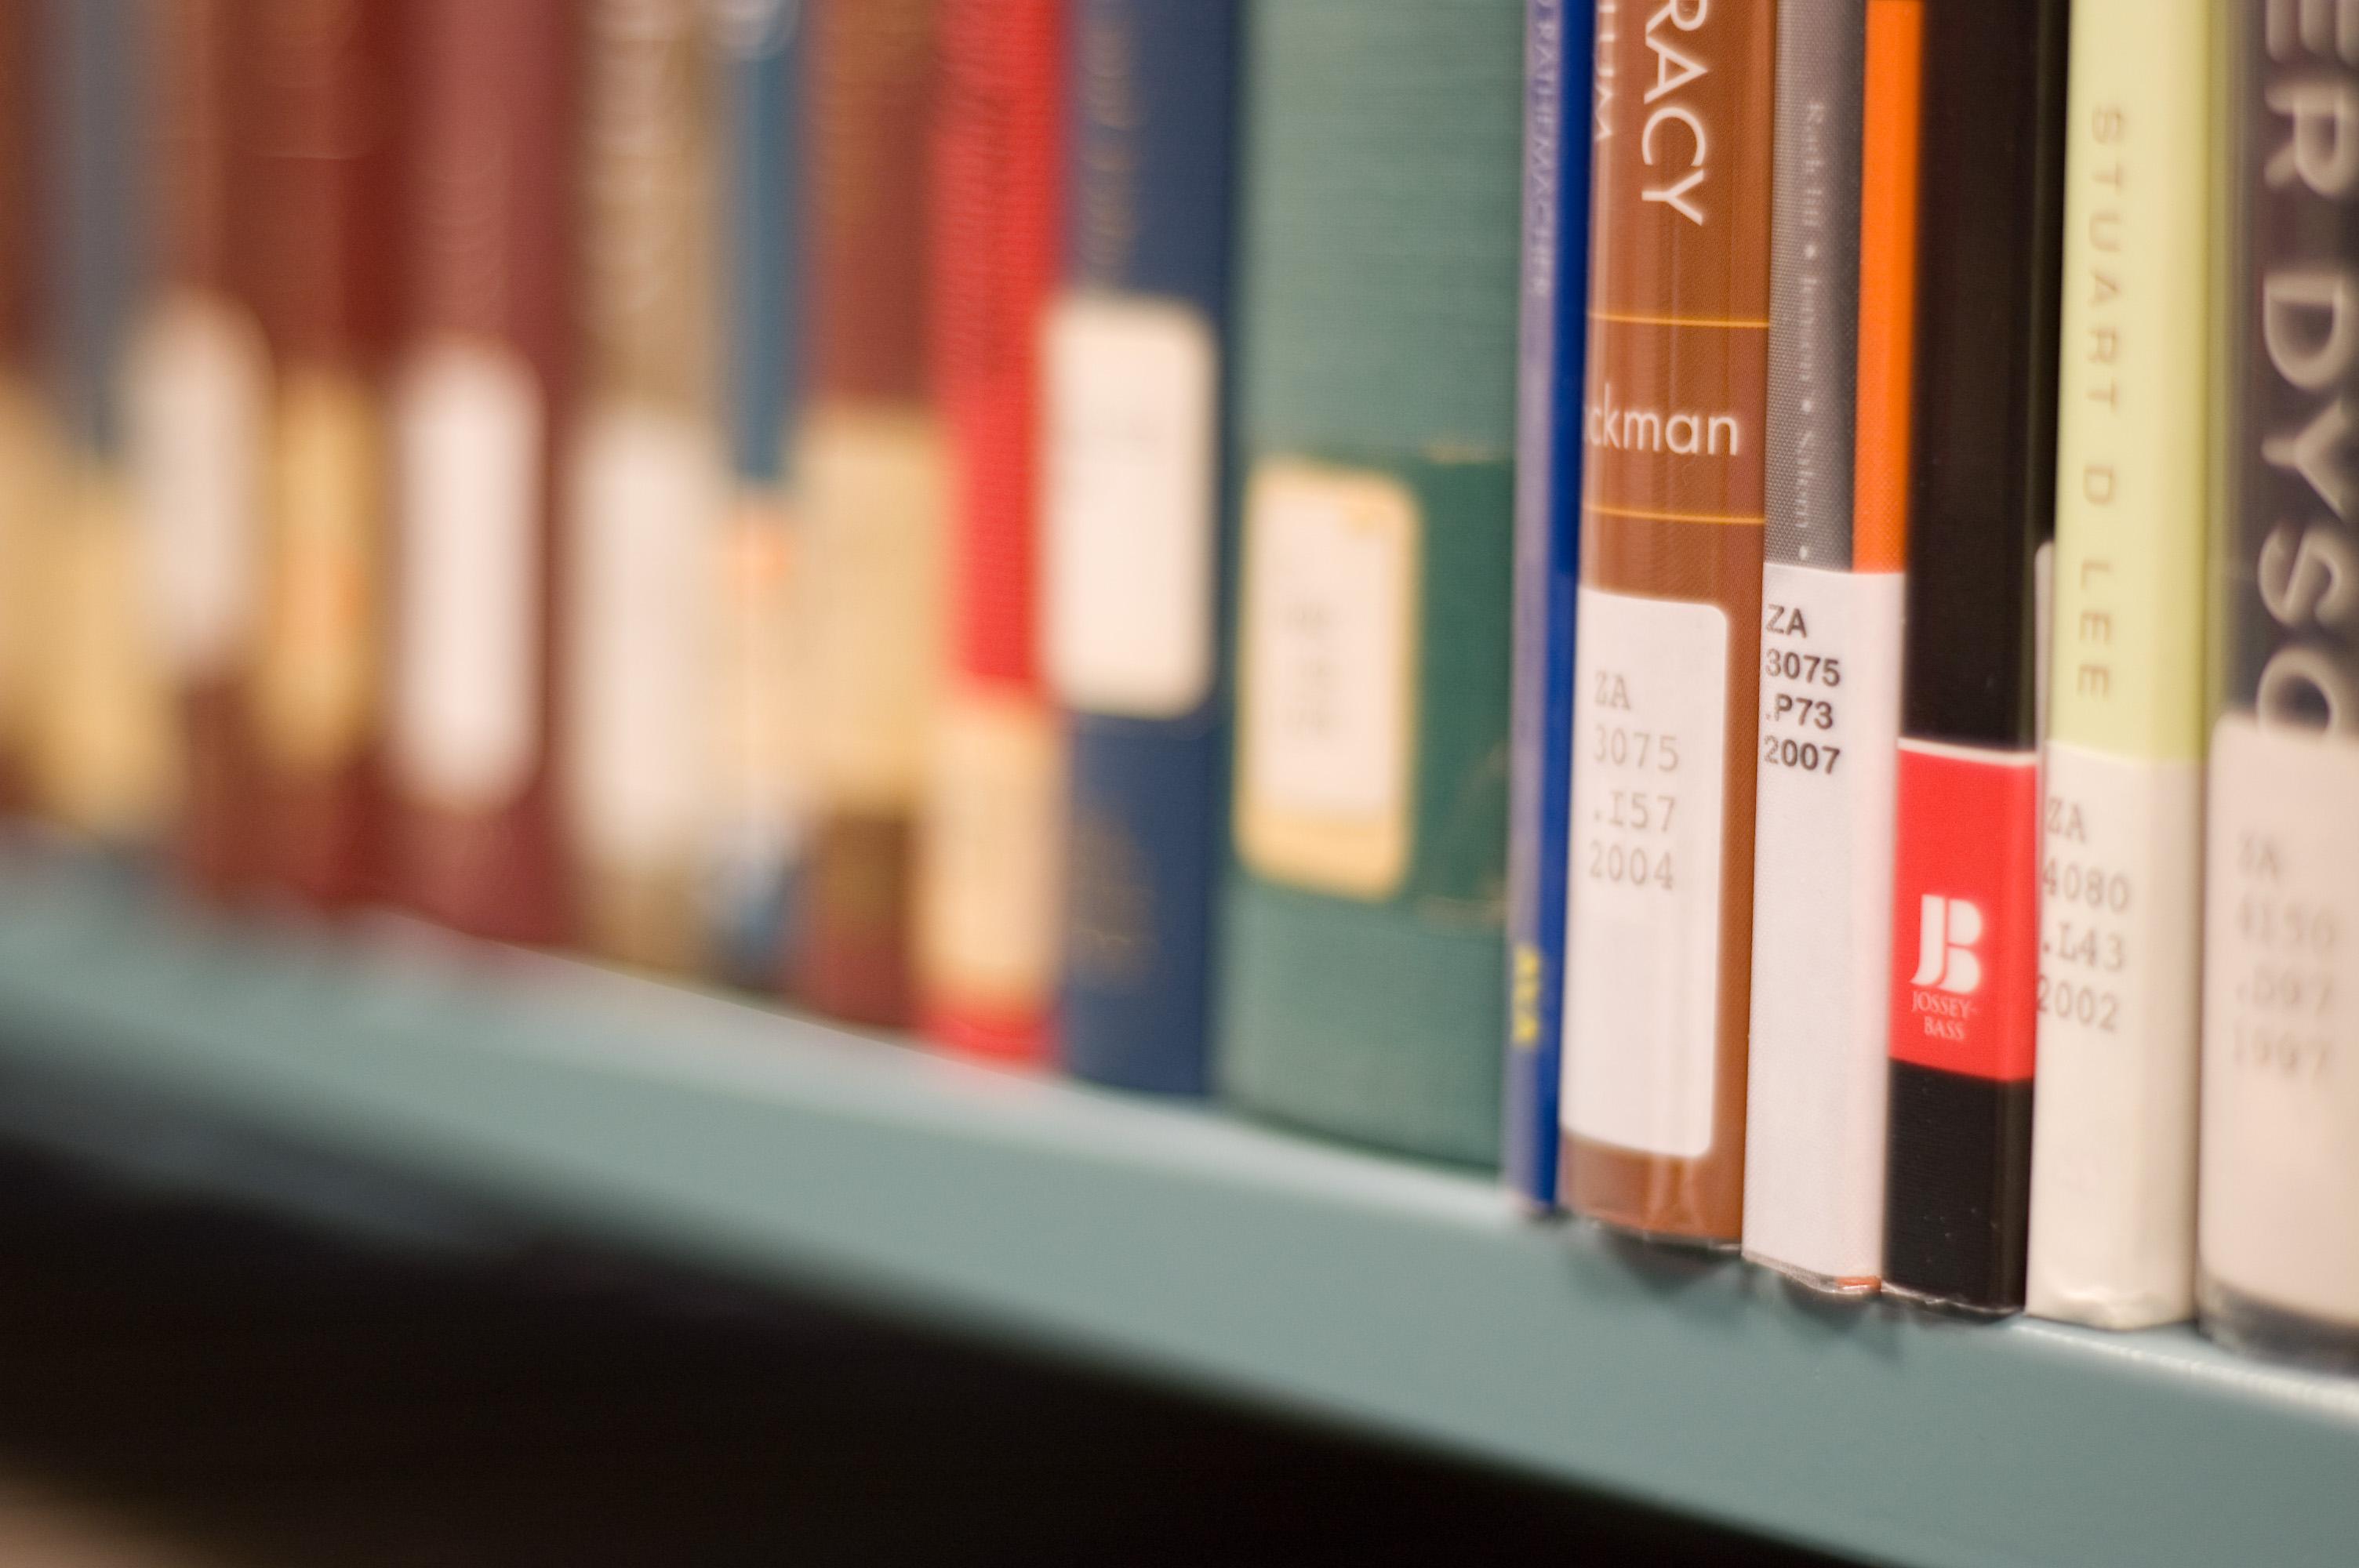 Literature Research Services